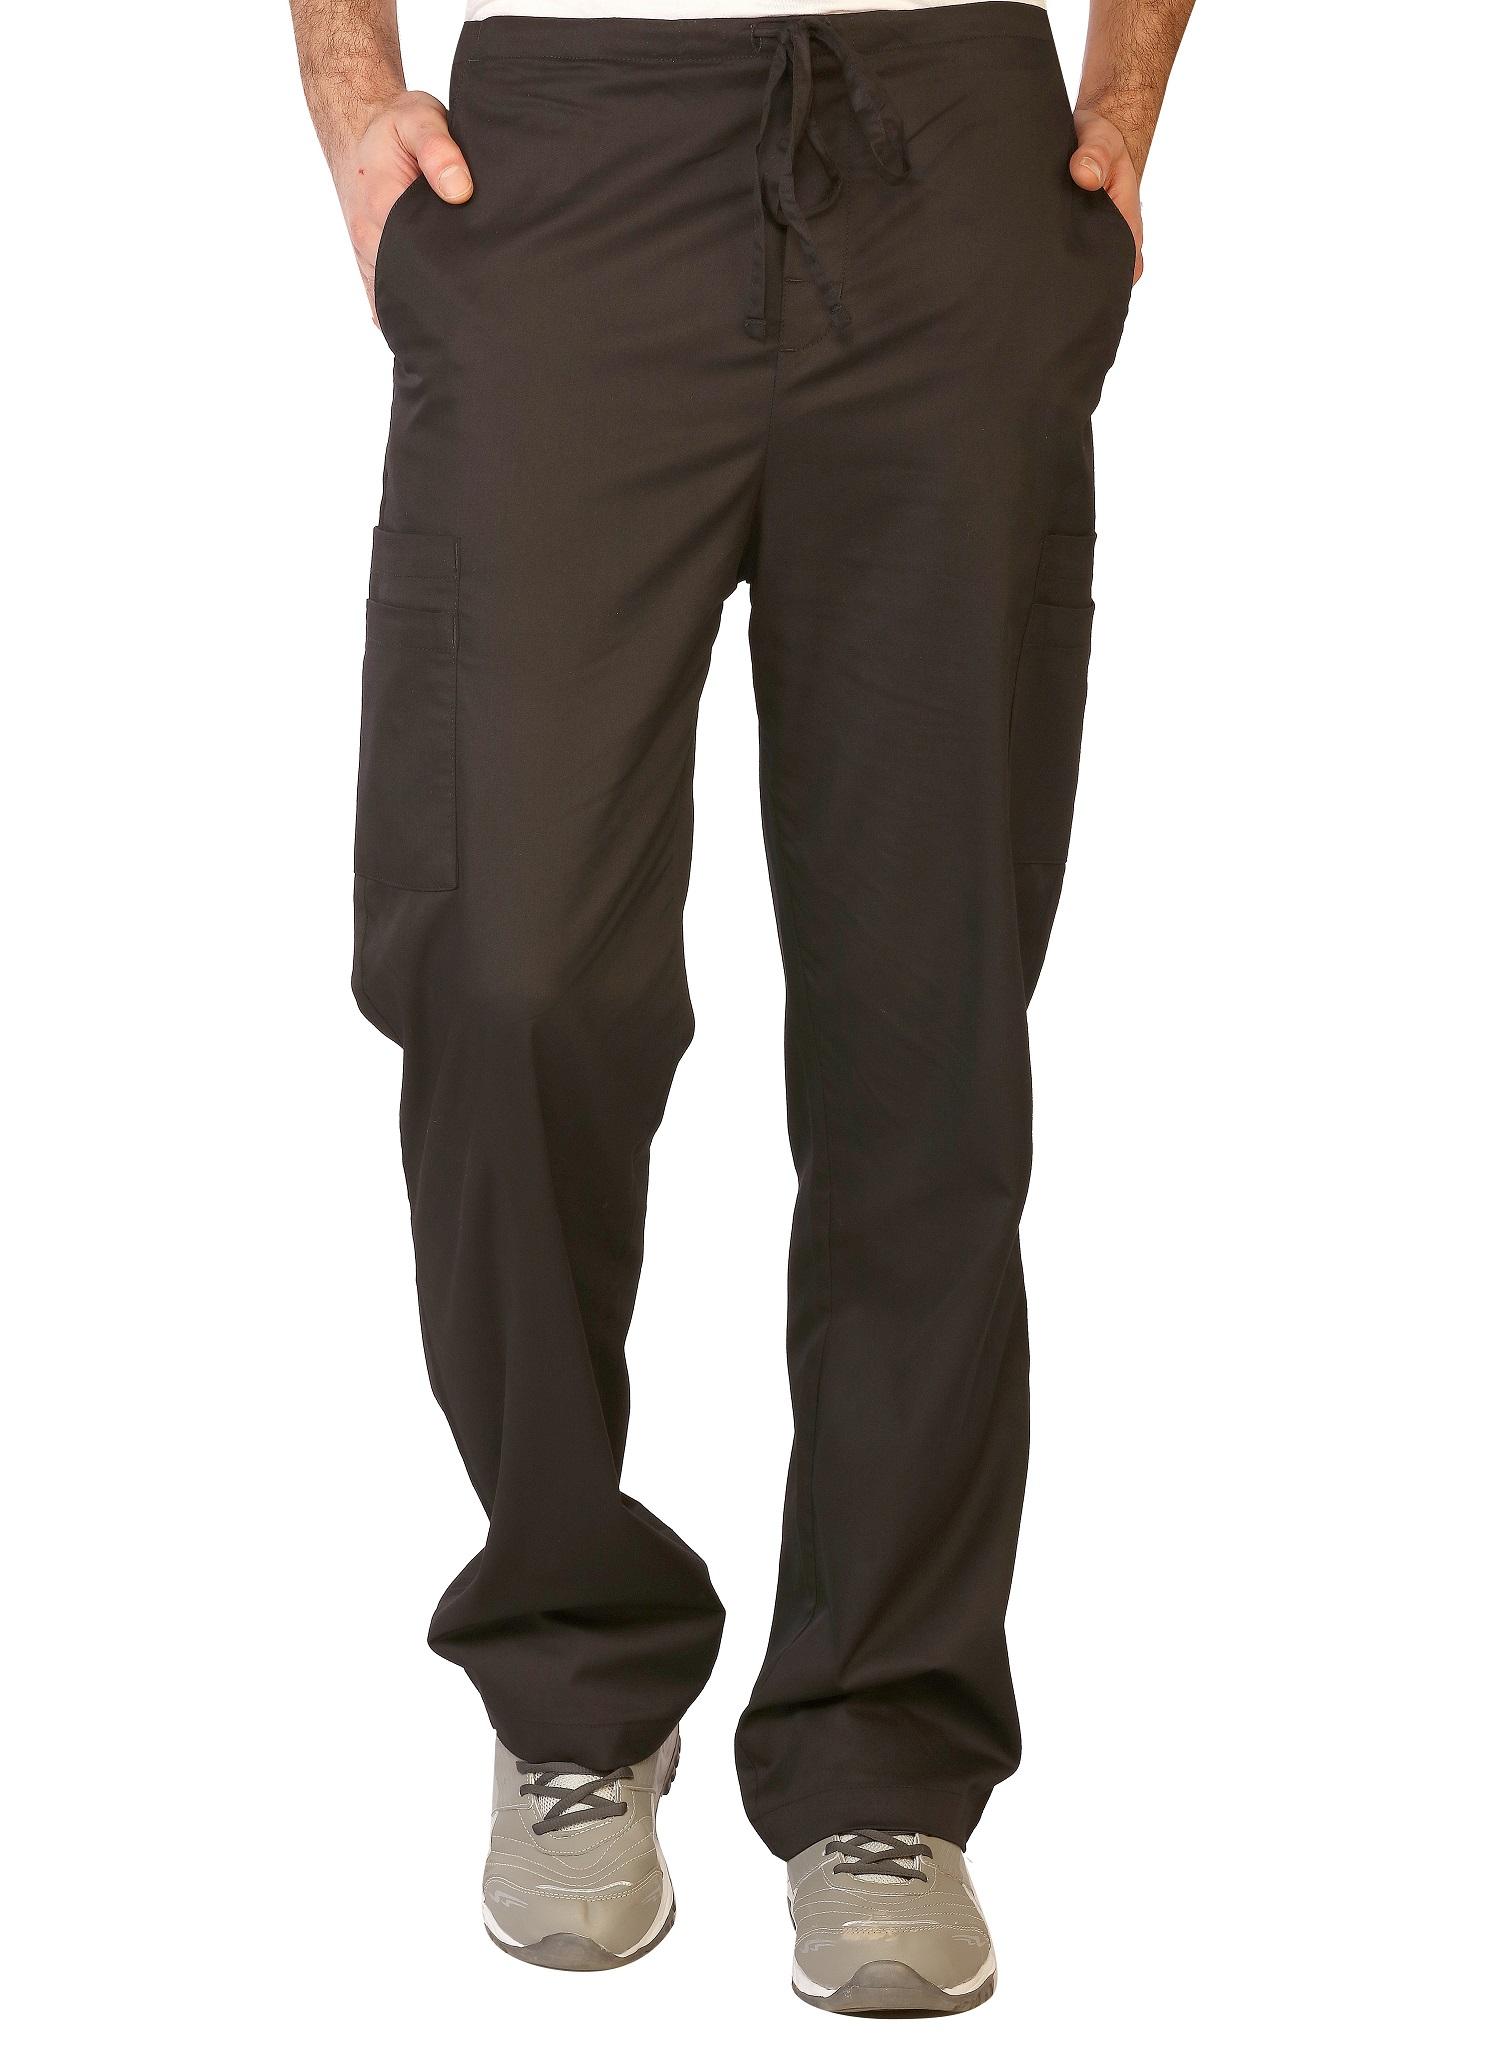 Mens Stretch Double Cargo Scrub Pants, LifeThreads Contego Collection